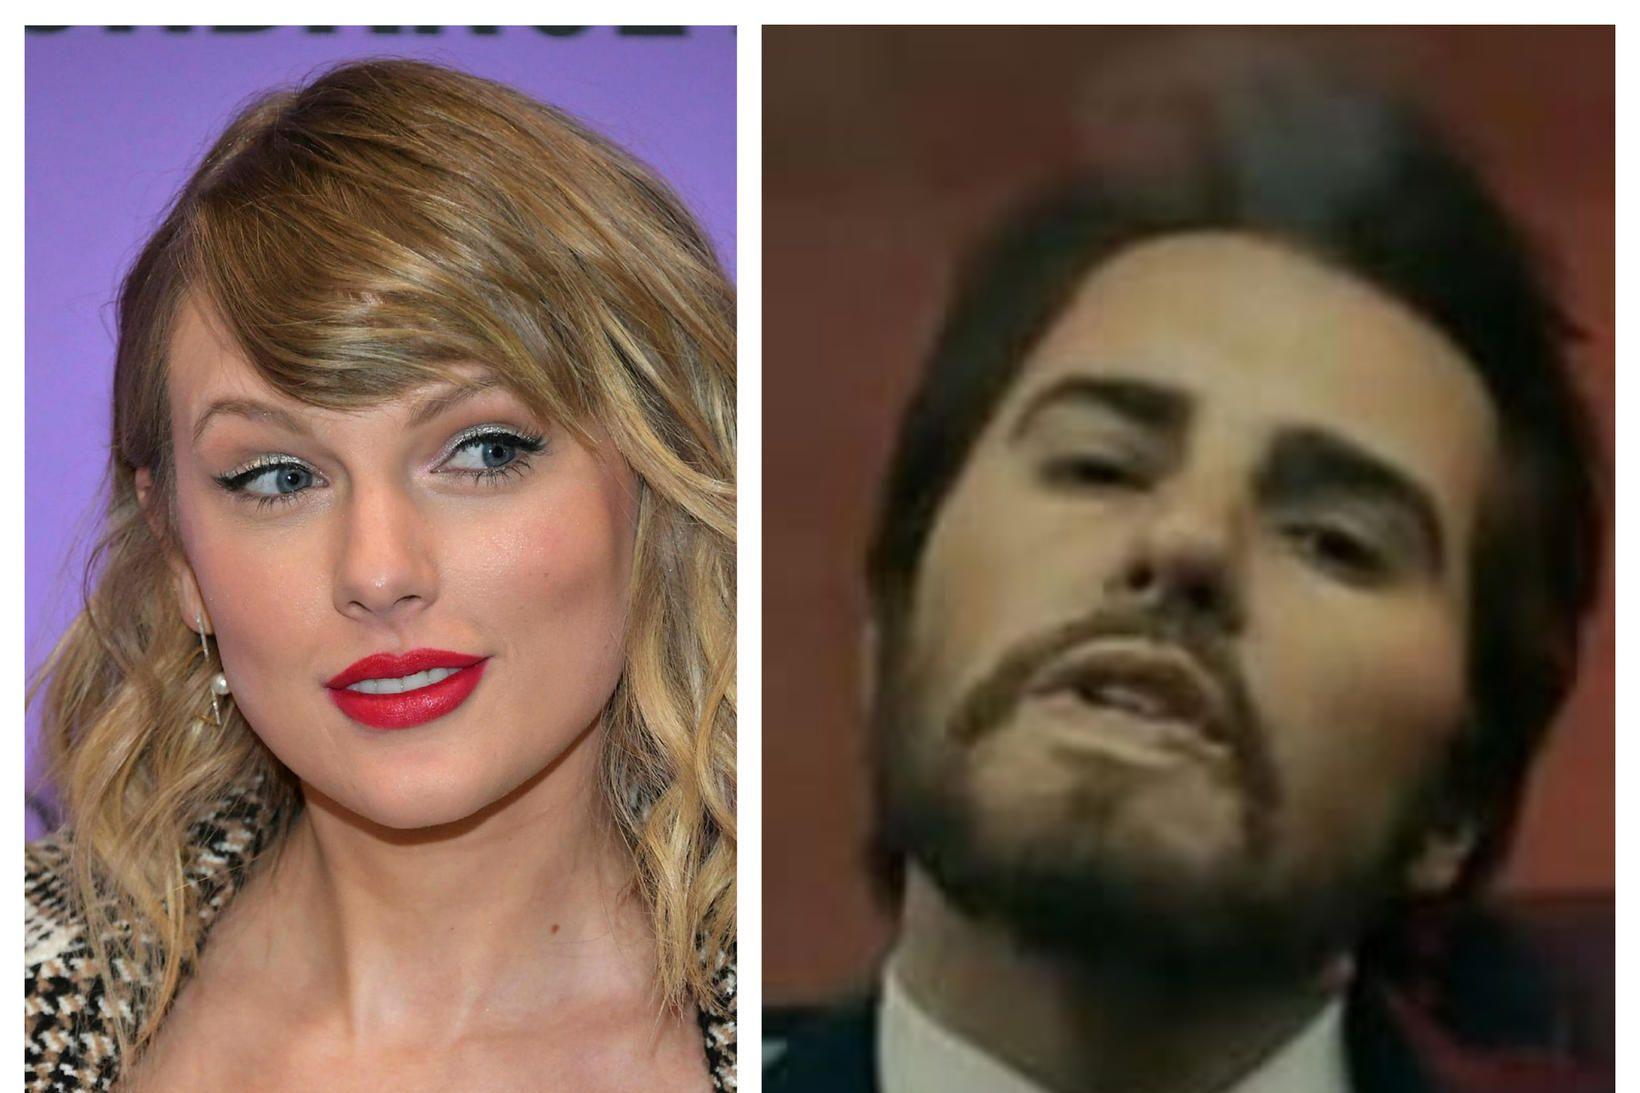 Taylor Swift sem kona og Taylor Swift sem karlmaður.